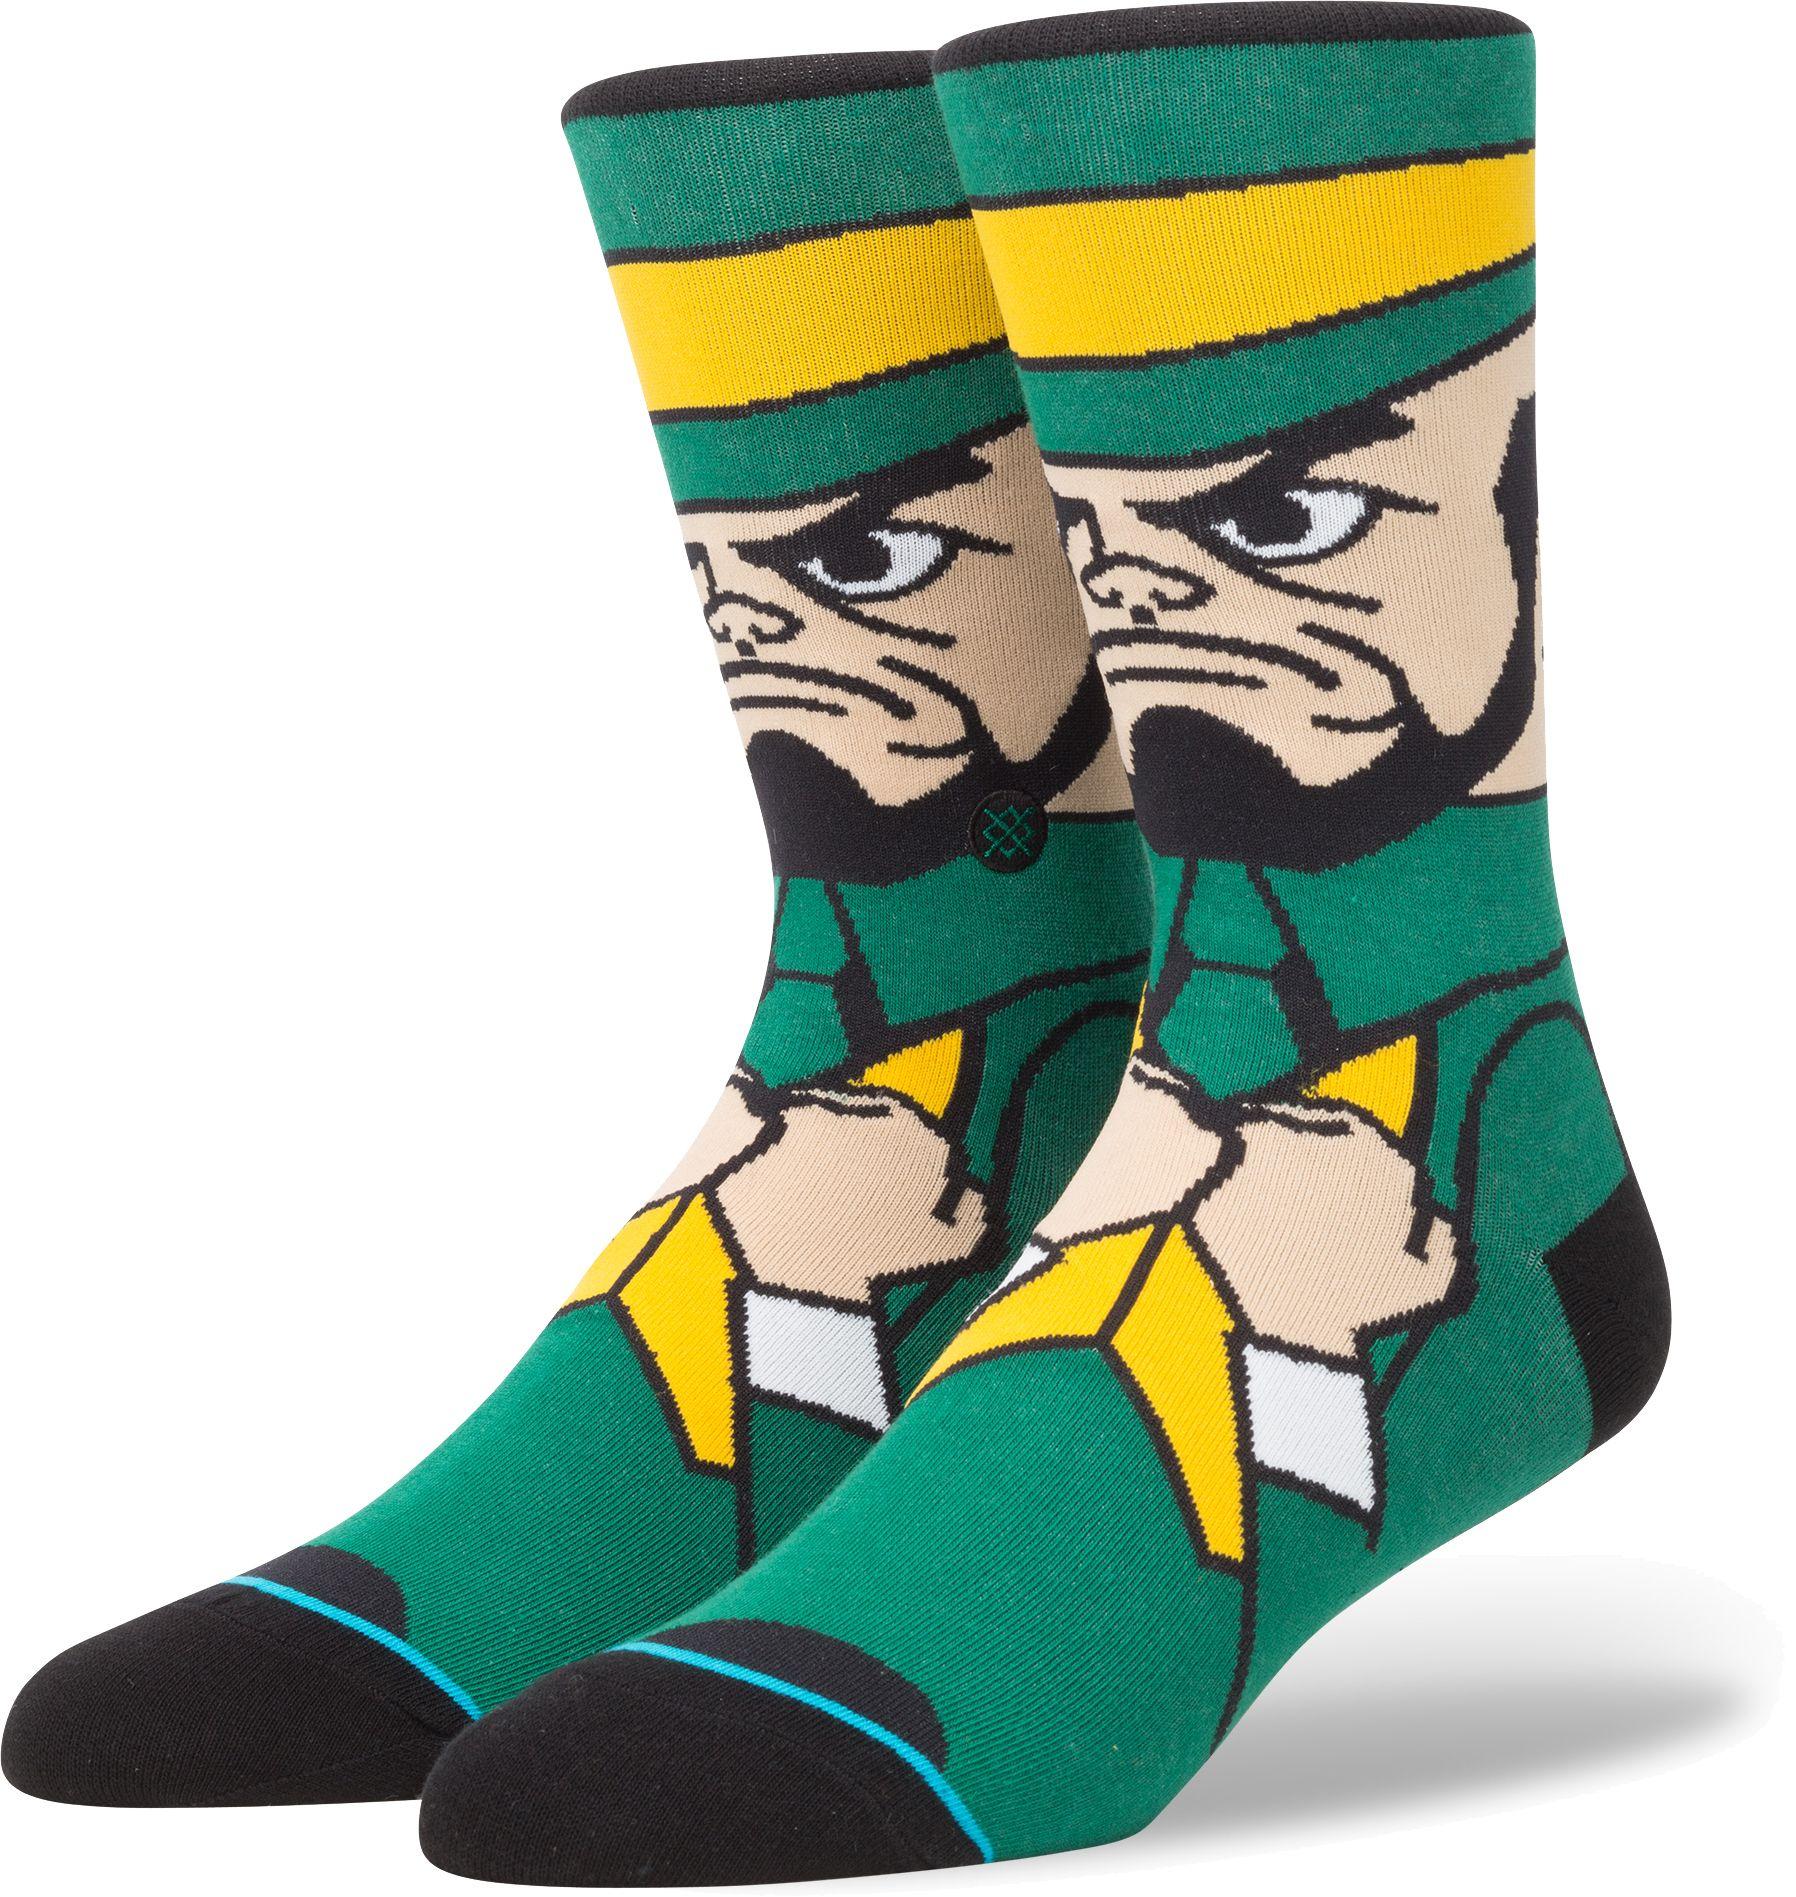 Product Image Stance Notre Dame Fighting Irish Mascot Socks